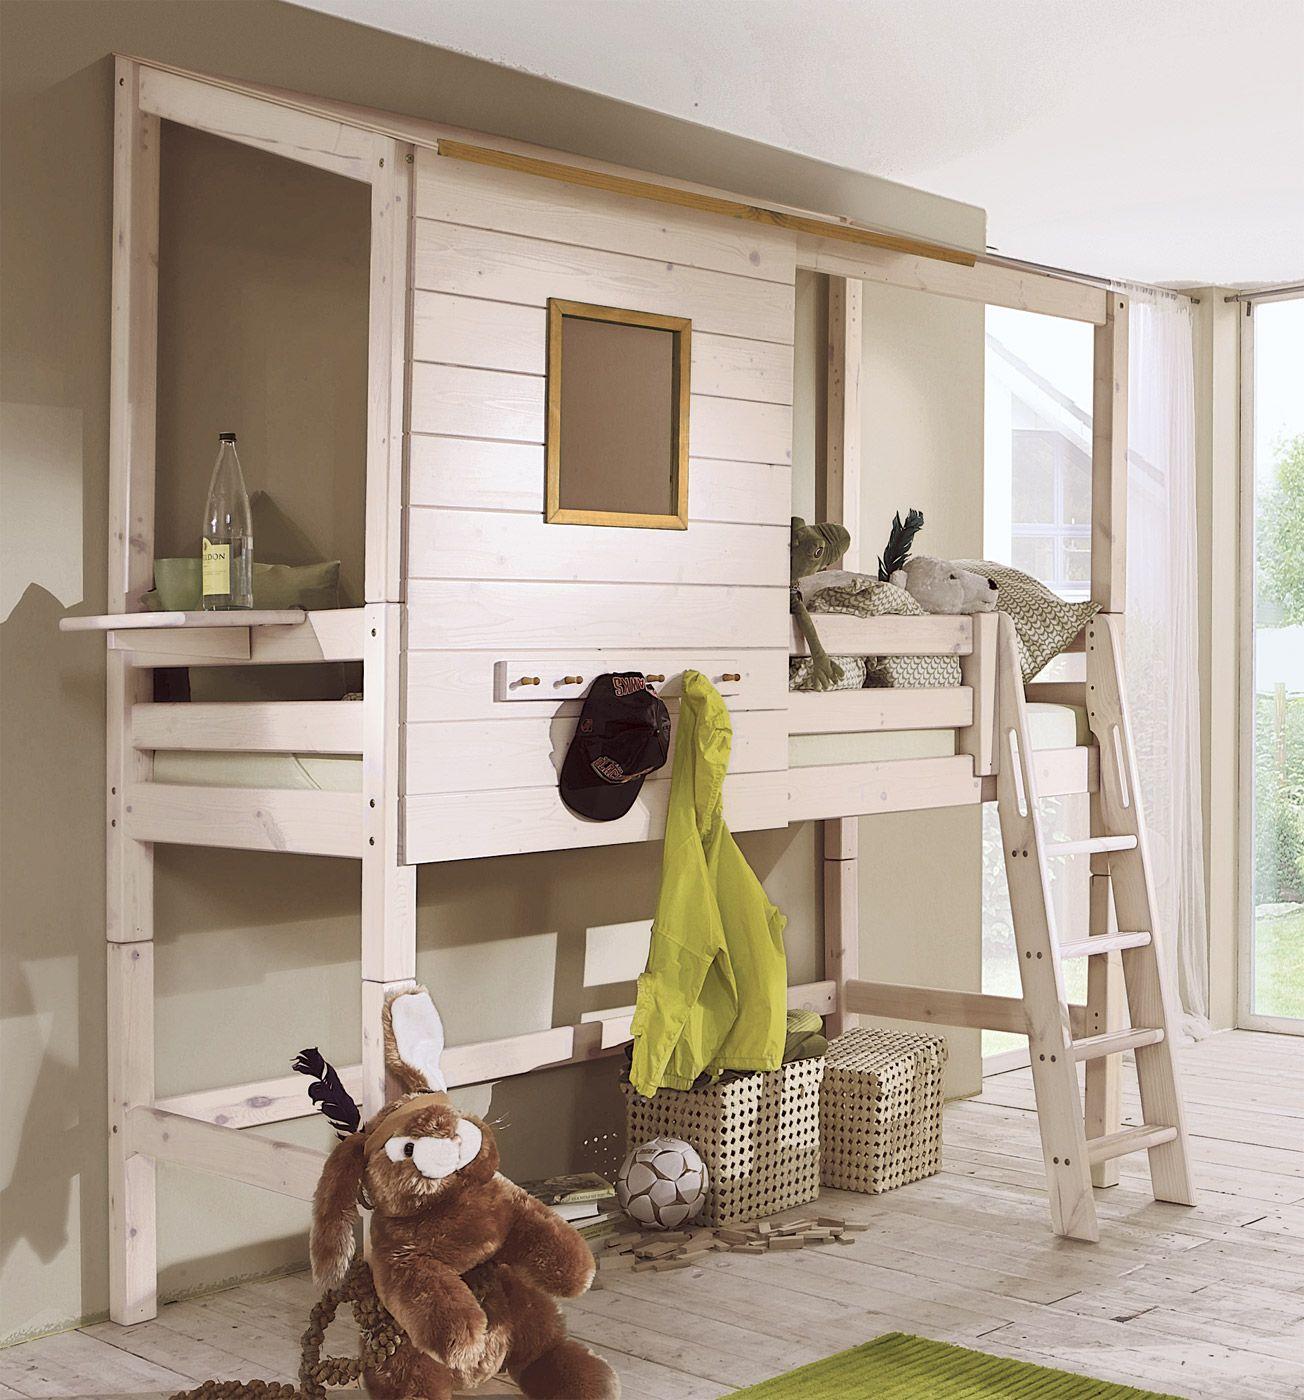 abenteuer hochbett kids paradise hochbetten abenteuer. Black Bedroom Furniture Sets. Home Design Ideas